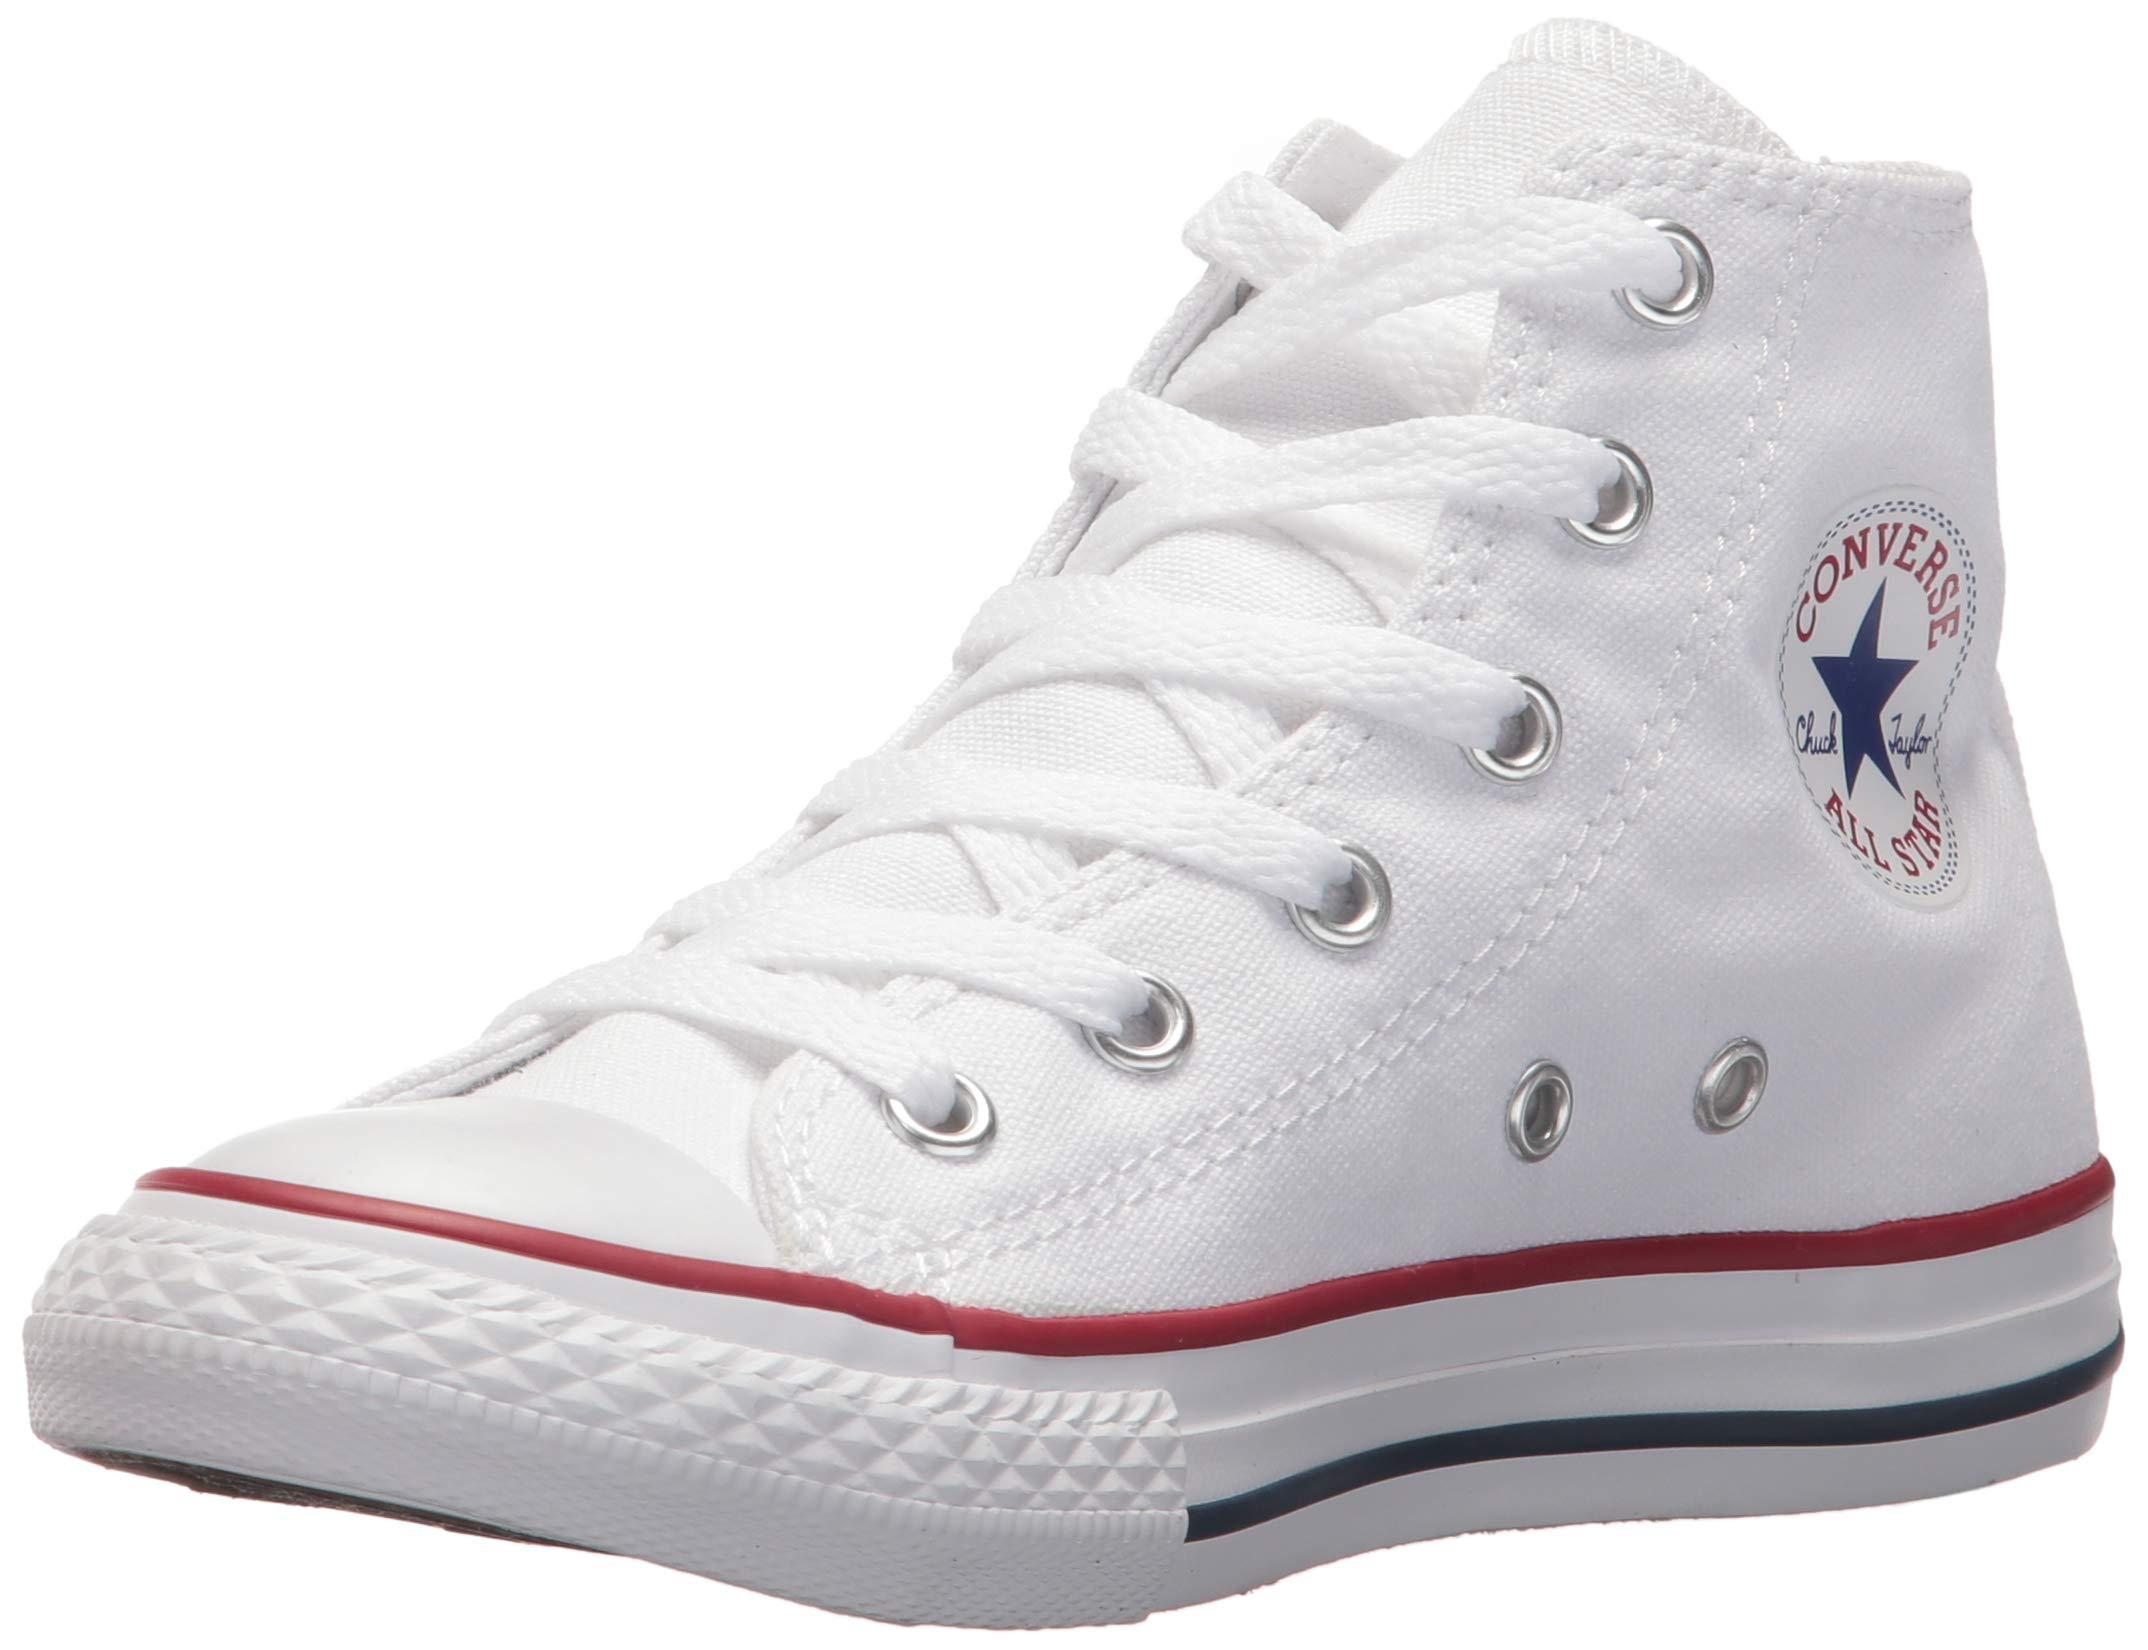 Converse Chuck Taylor All Star Hi Shoe - Toddler Girls' Optical White, 8.0